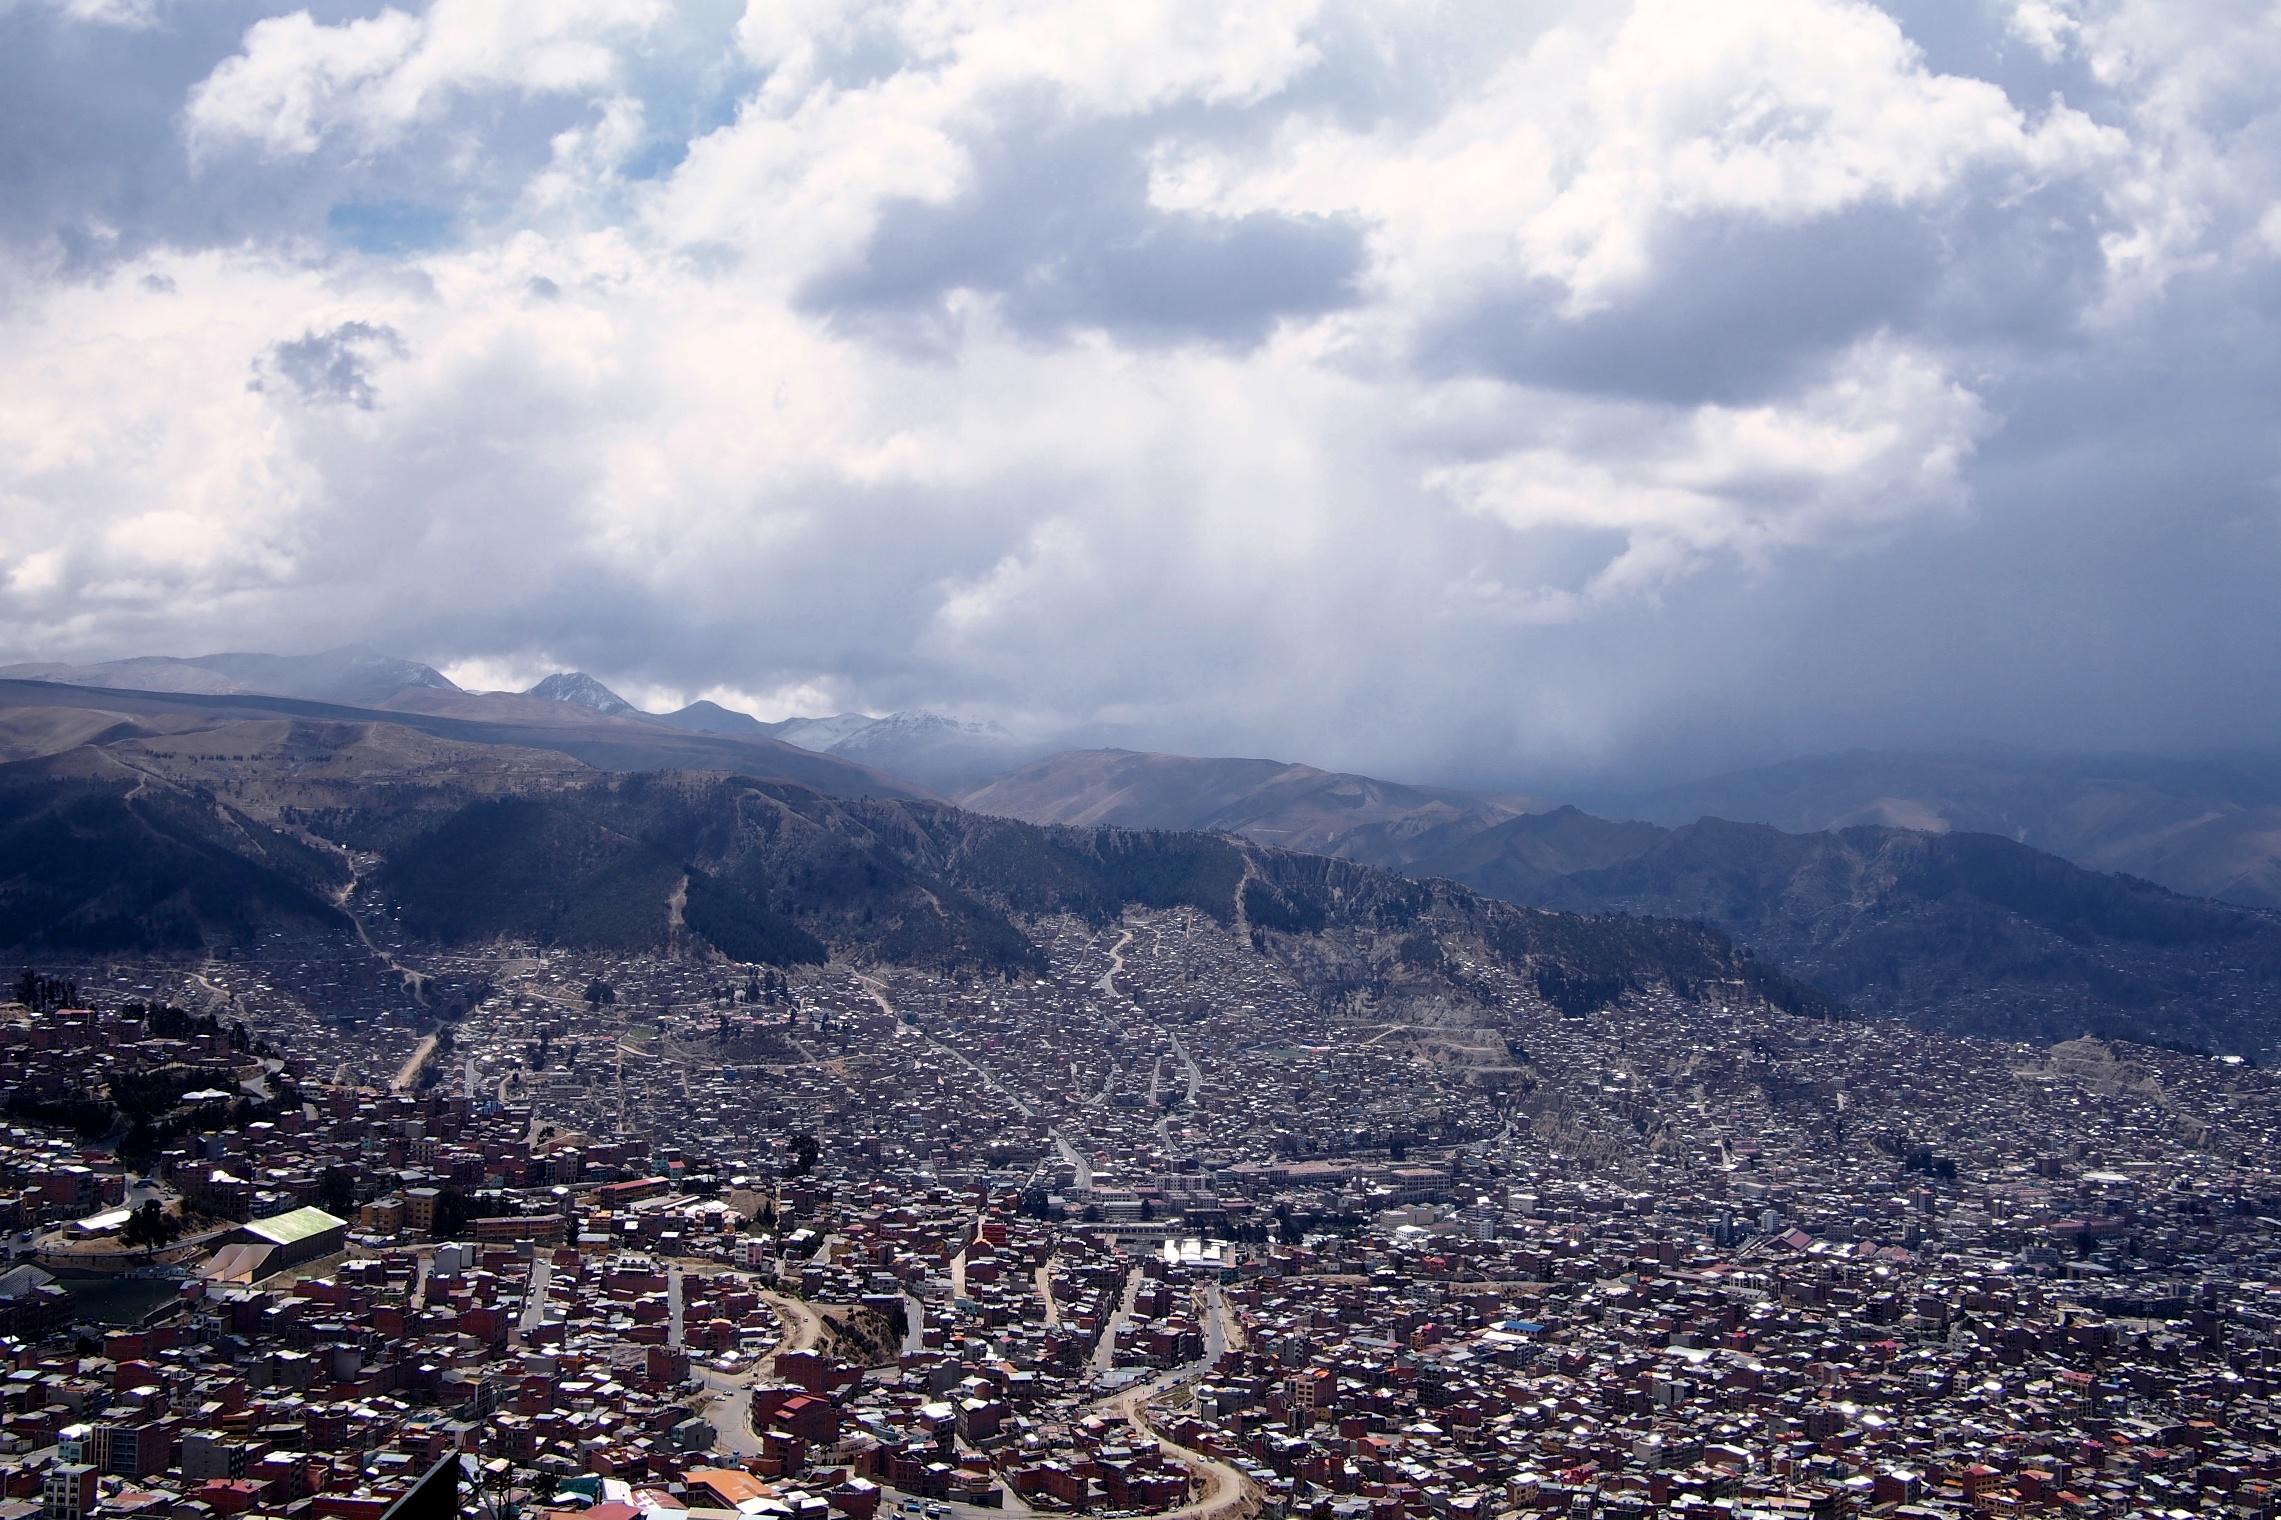 View of La Paz from the market in El Alto